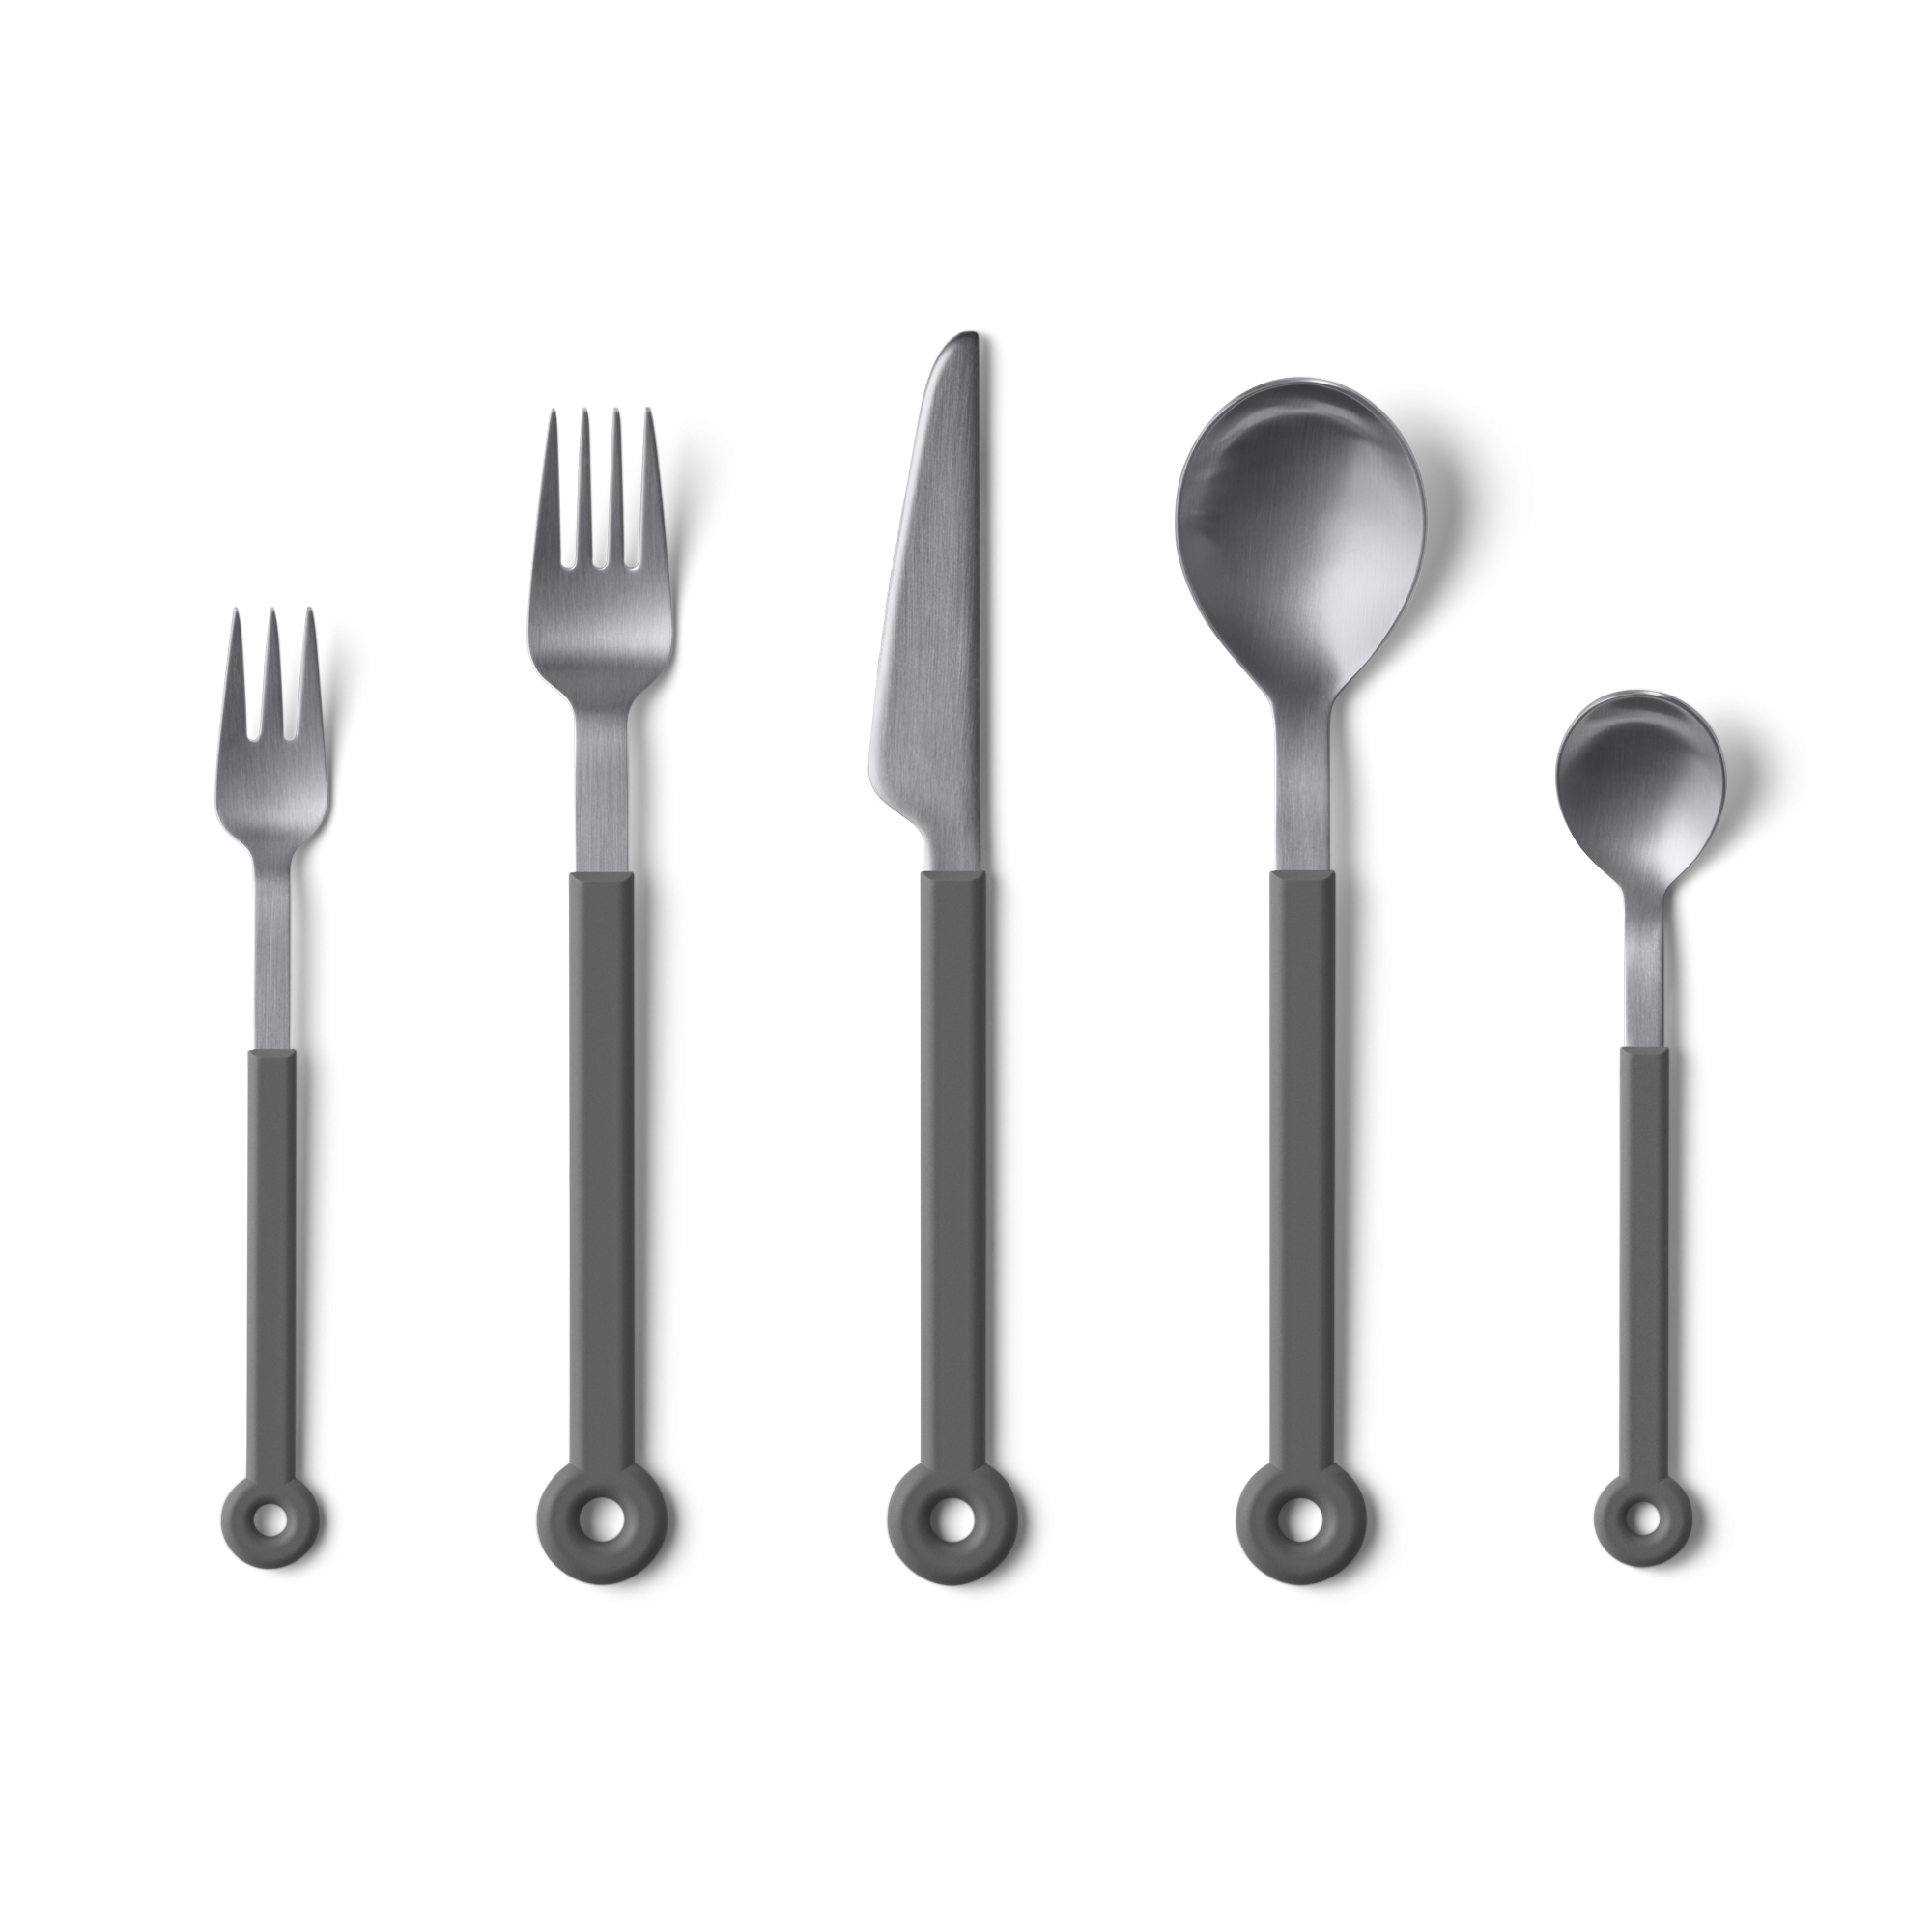 mono-ring-flatware-5-piece-set-grey-1